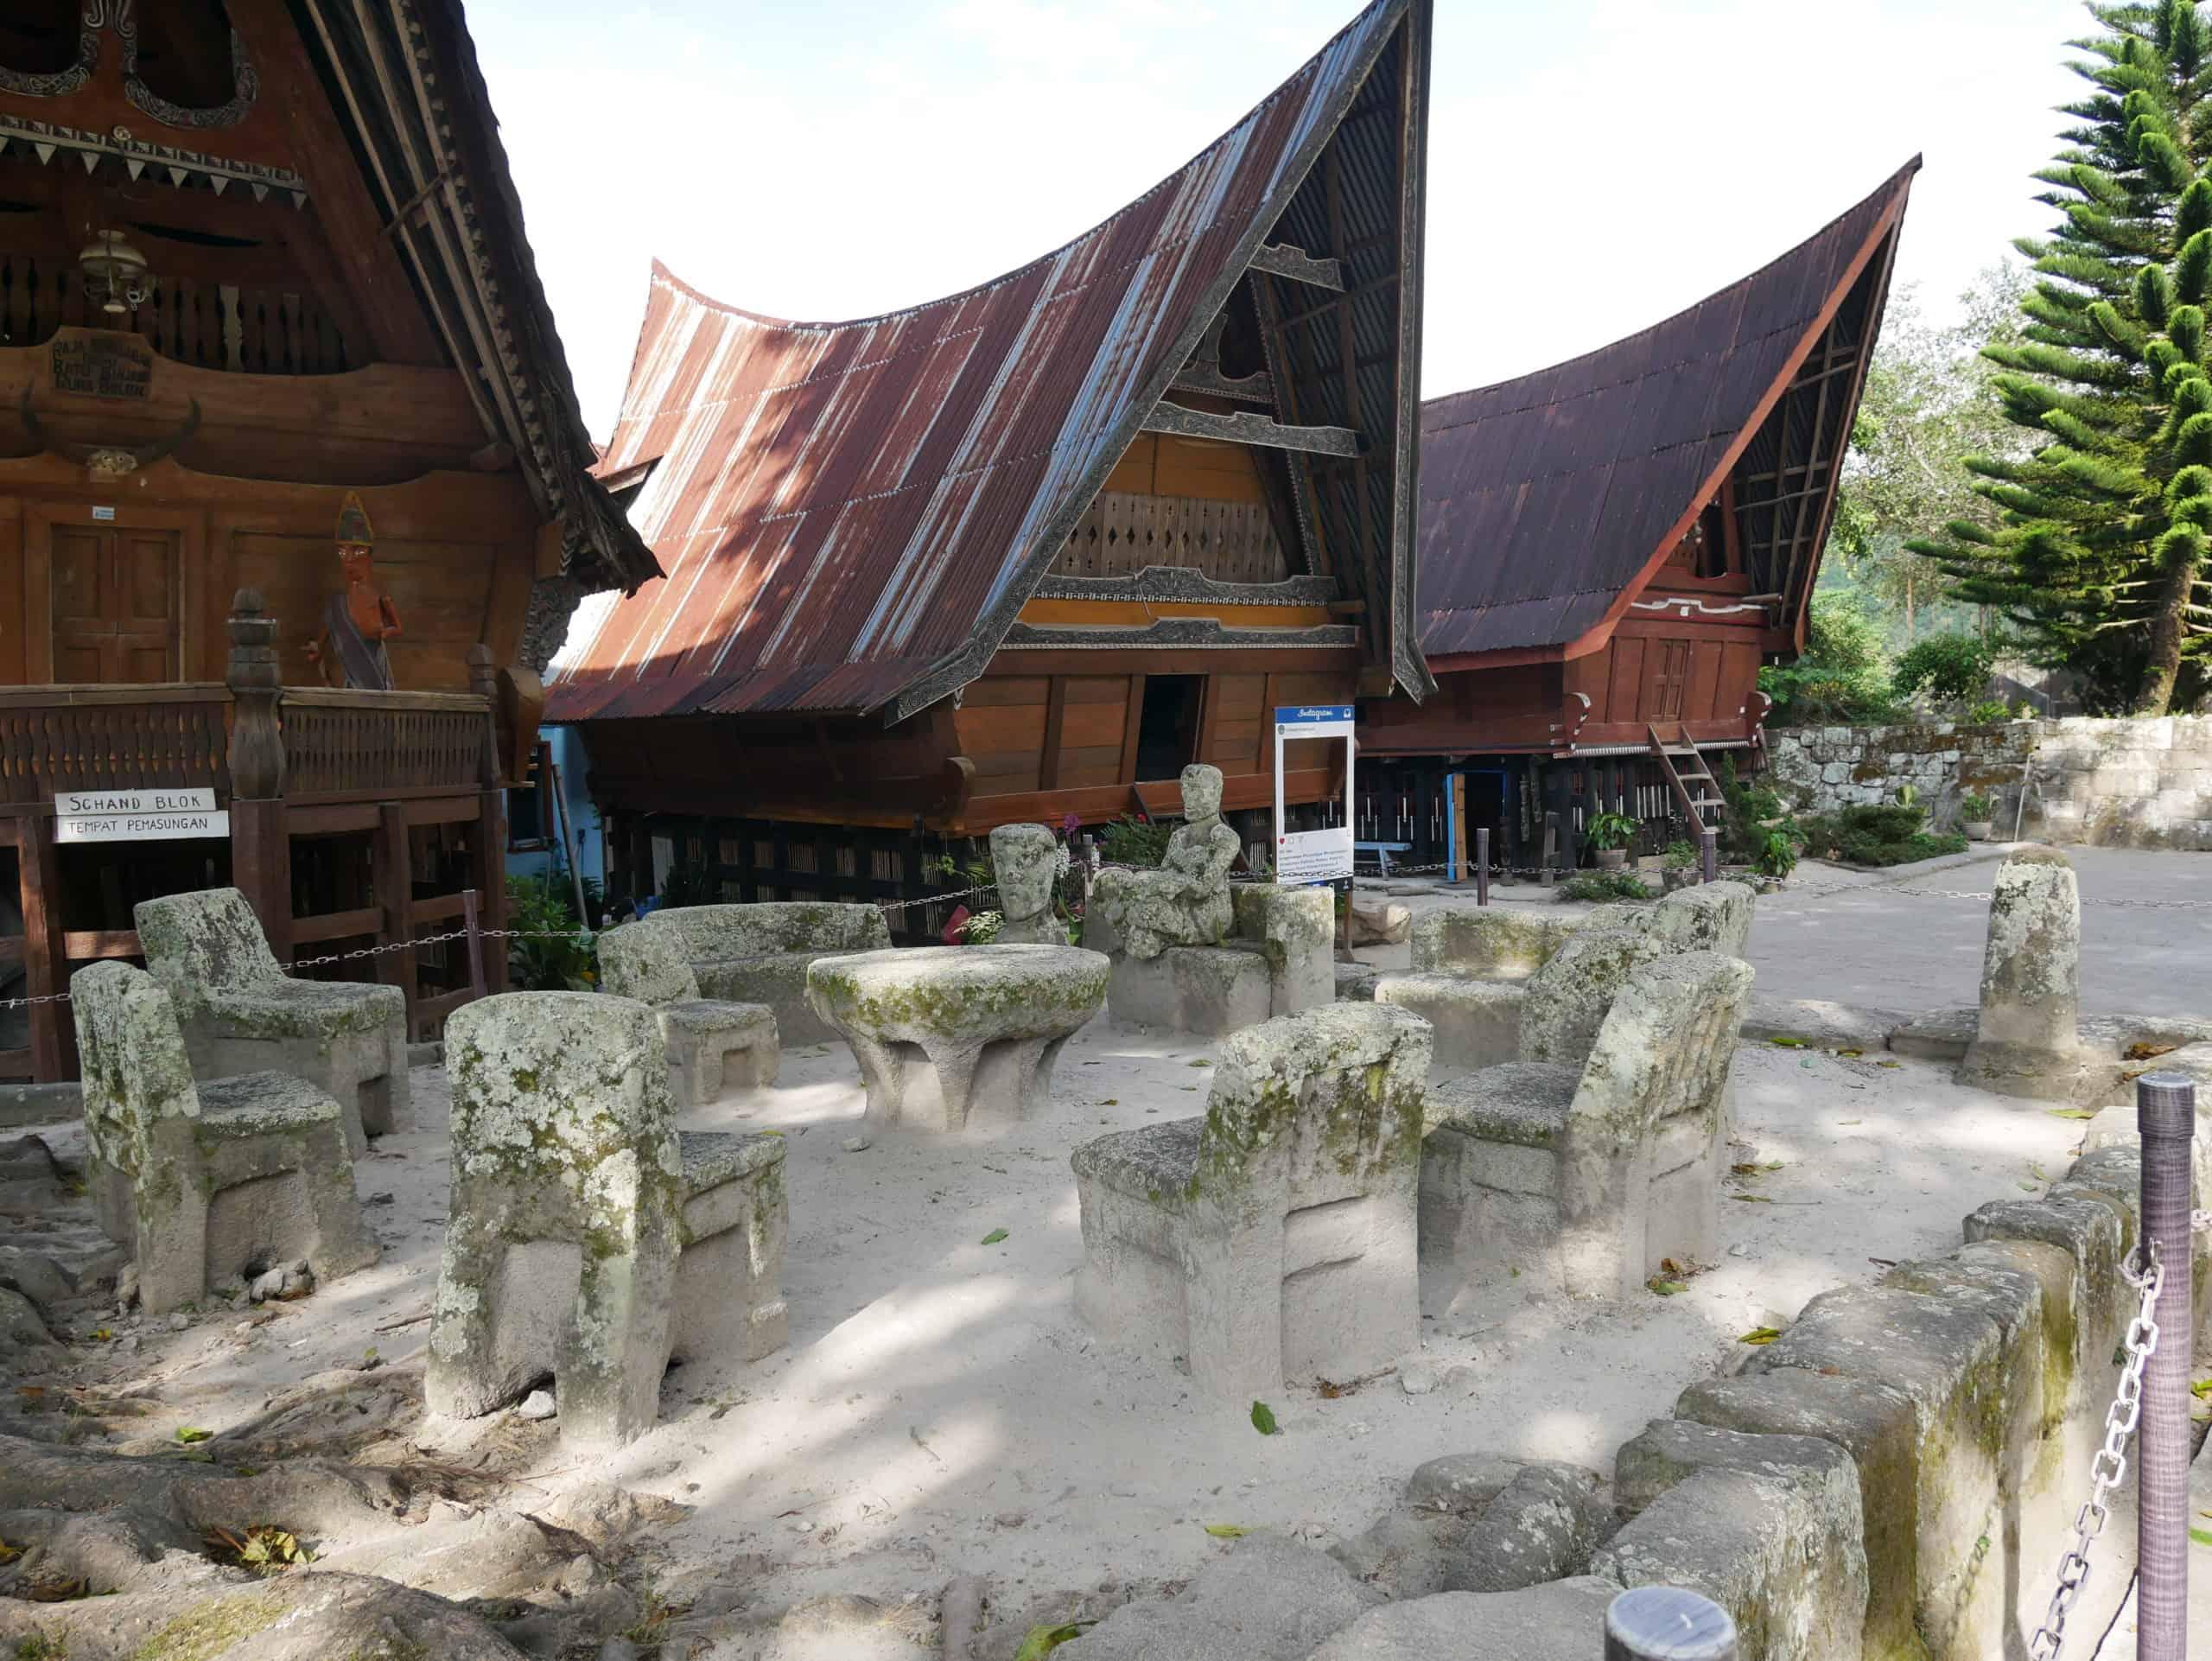 Sehenswürdigkeiten Samosir: Stone Chairs im Dorf Ambarita